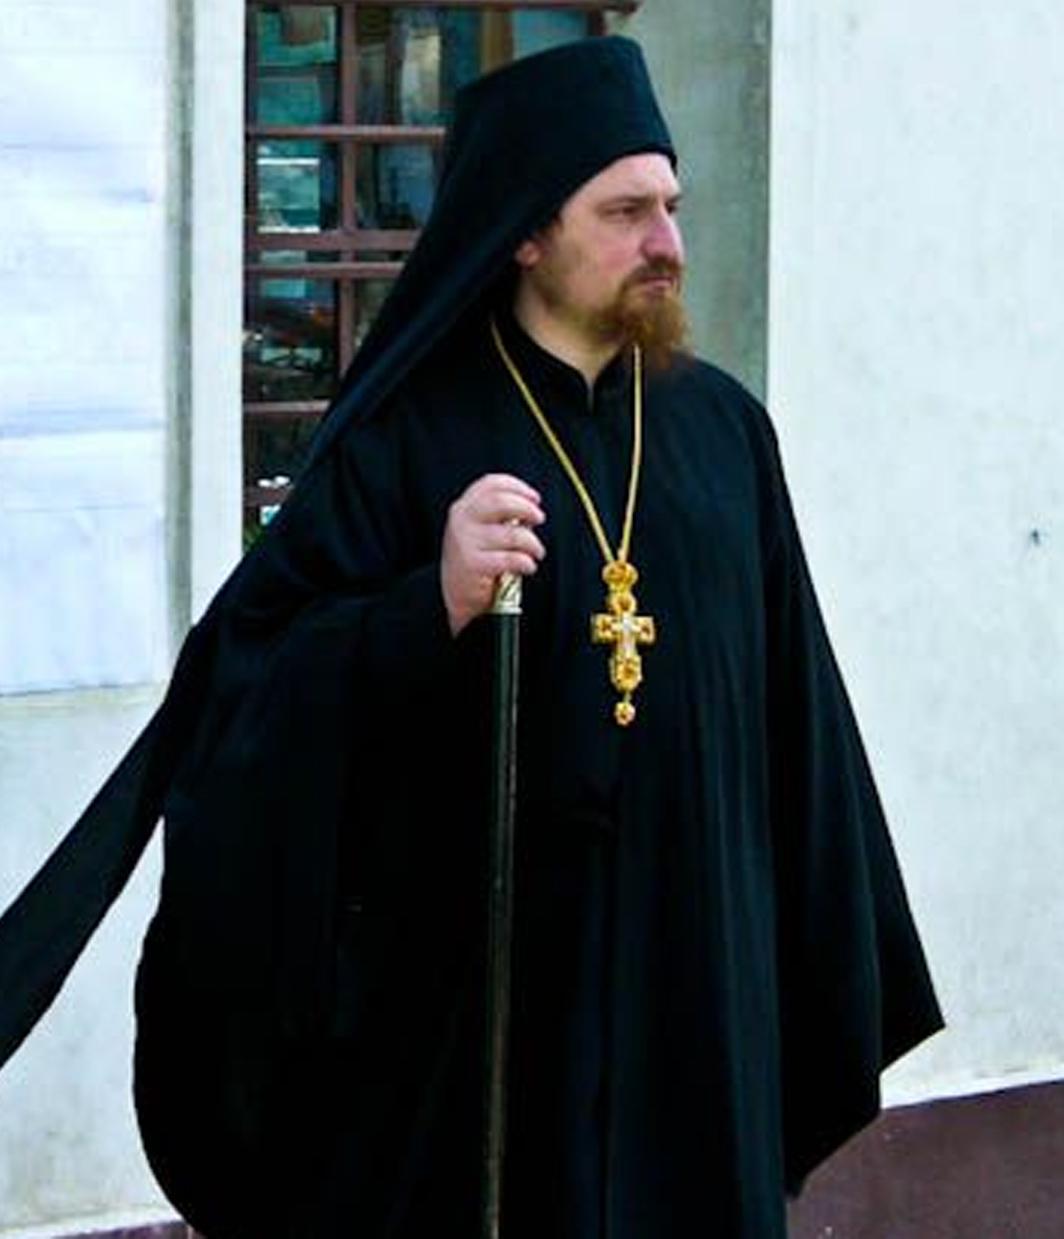 Yerotei_Kosakov_Episkop_Agatopolski-abbot-Pomorie-Monastery